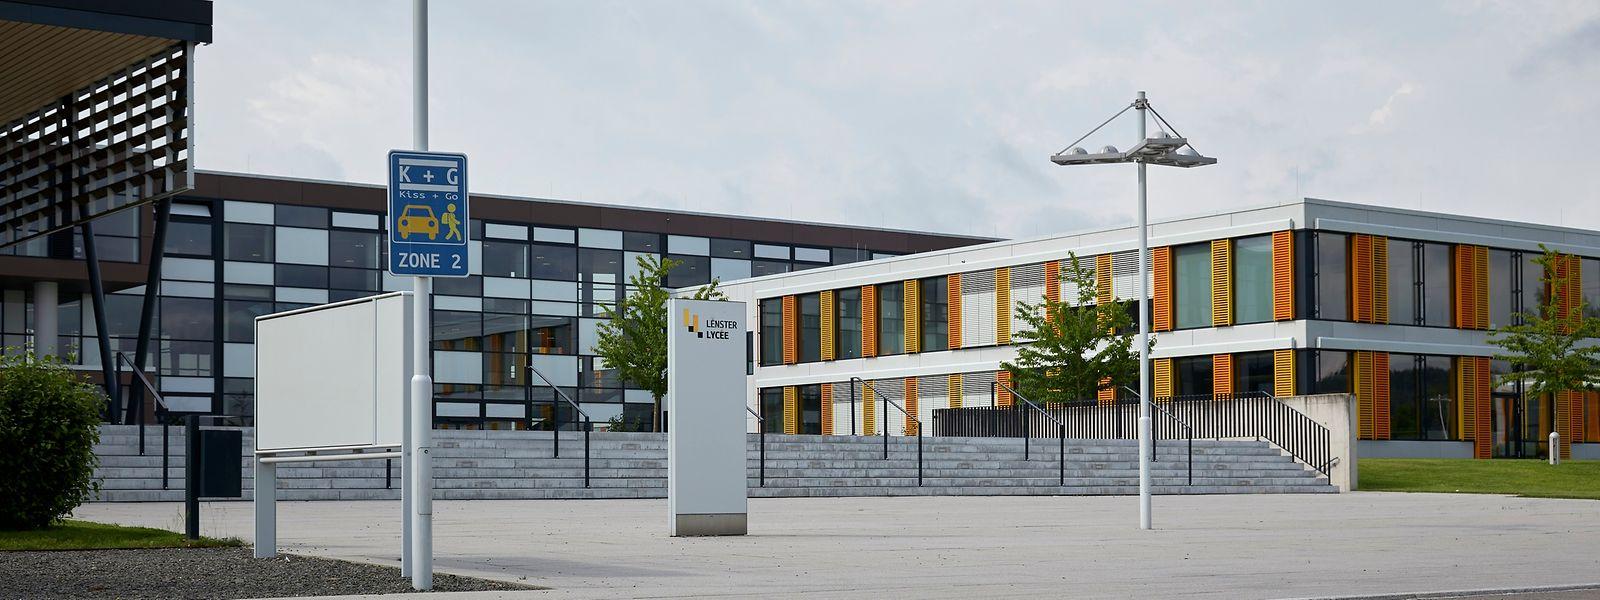 Im Lënster Lycée werden zurzeit 800 Schüler unterrichtet. Zur Rentrée im September kommen zusätzliche Schüler aus der International School Junglinster hinzu.